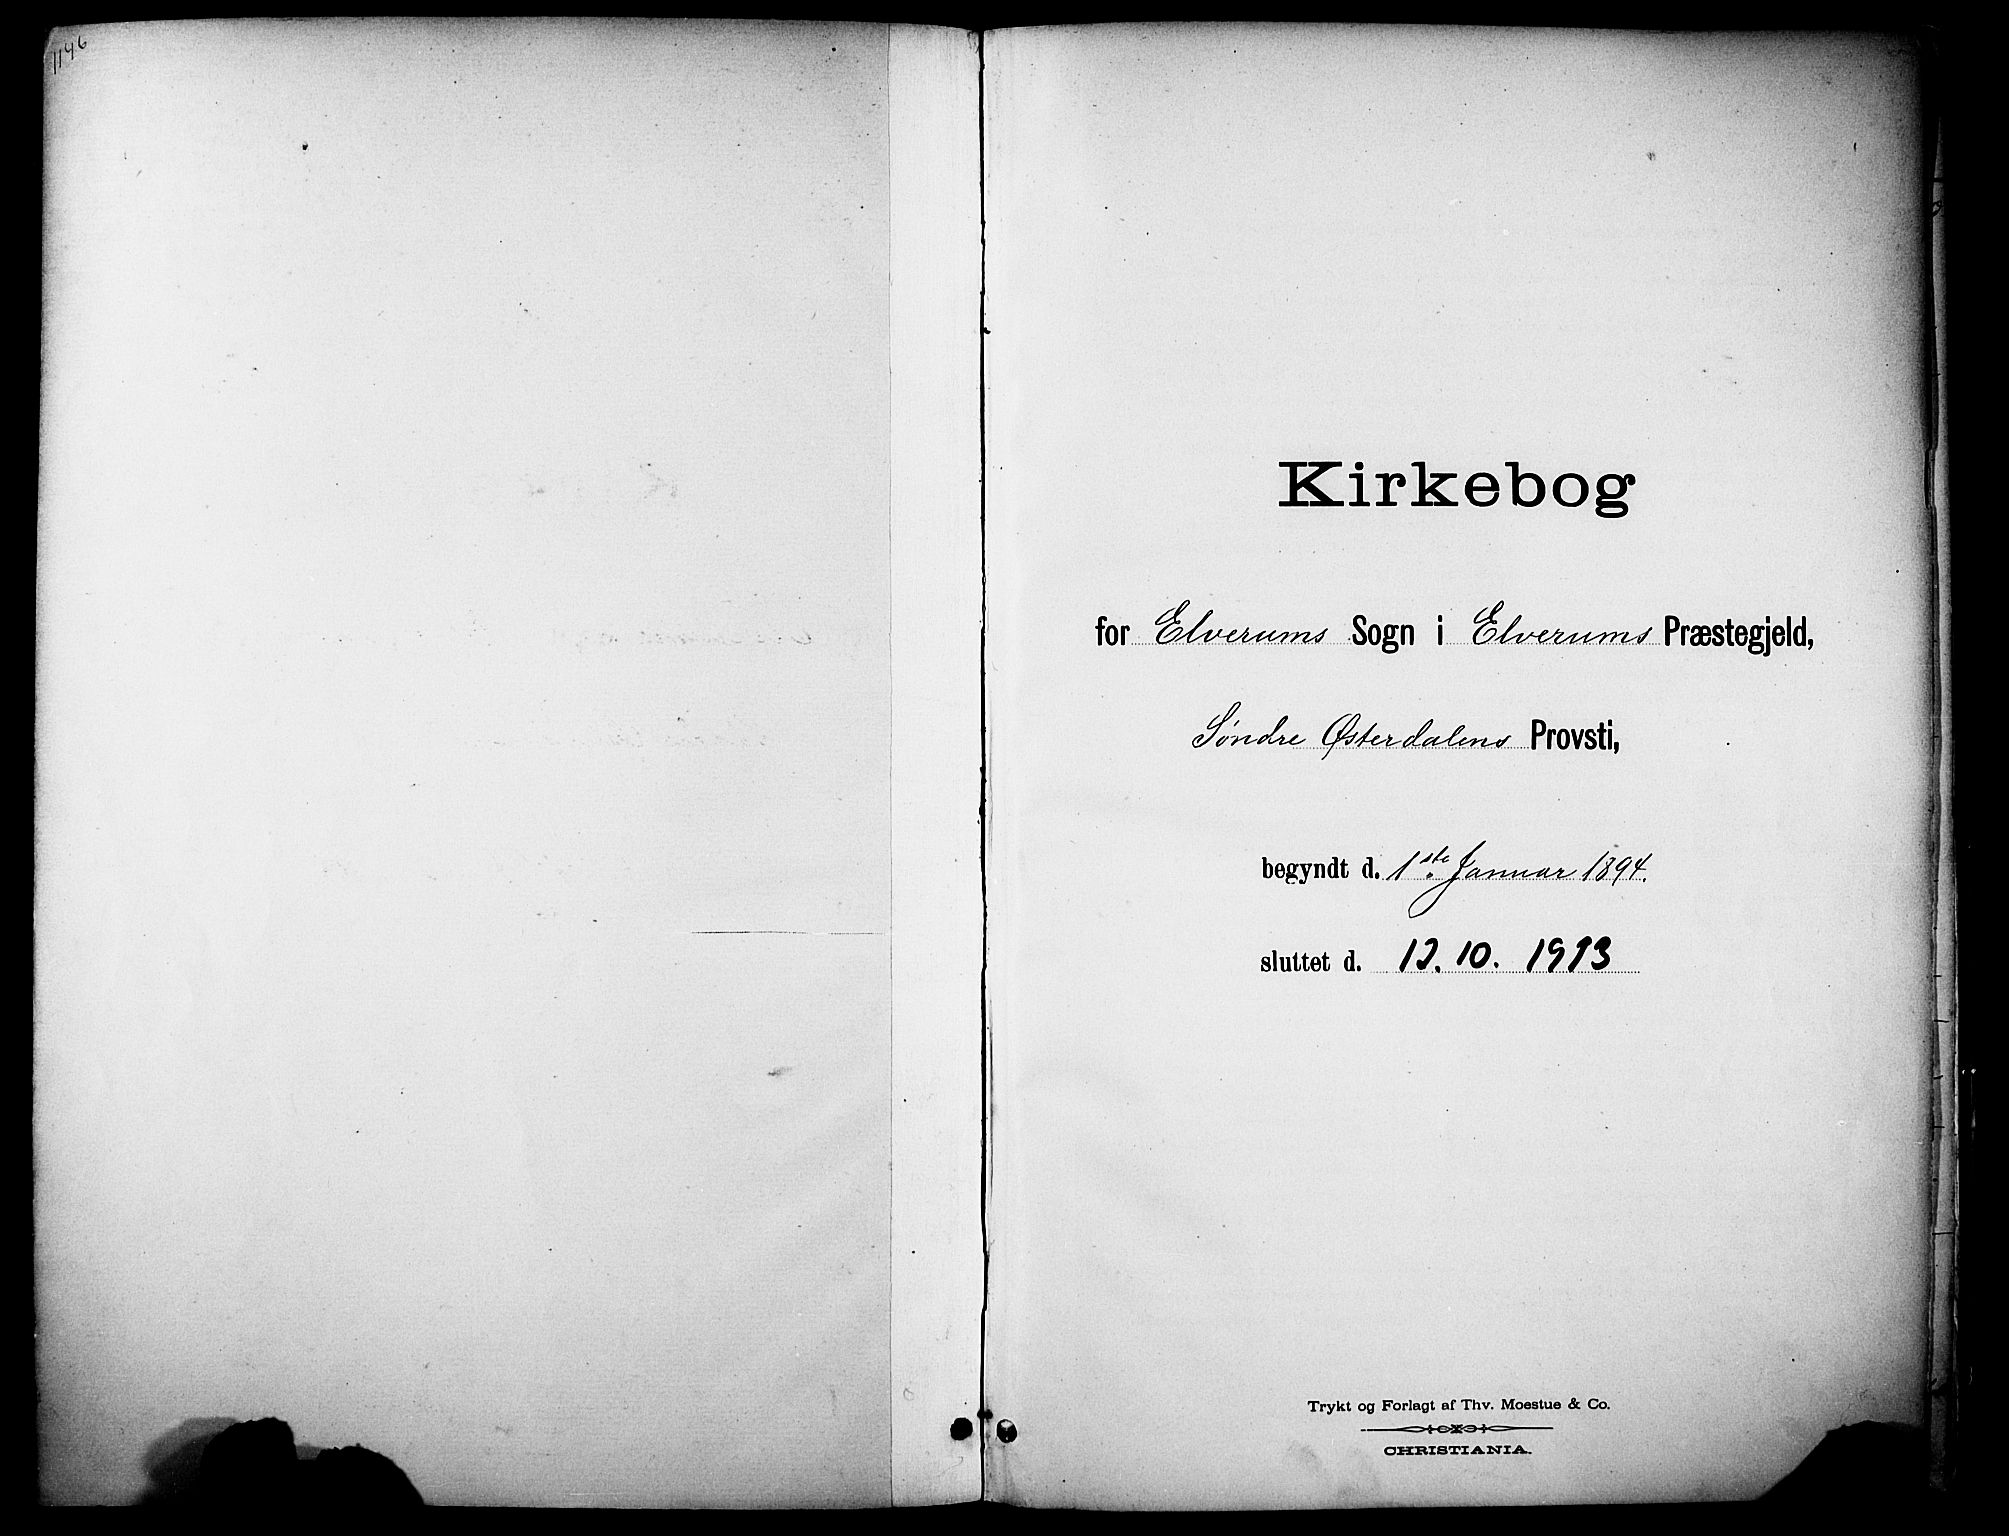 SAH, Elverum prestekontor, H/Ha/Haa/L0015: Ministerialbok nr. 15, 1893-1913